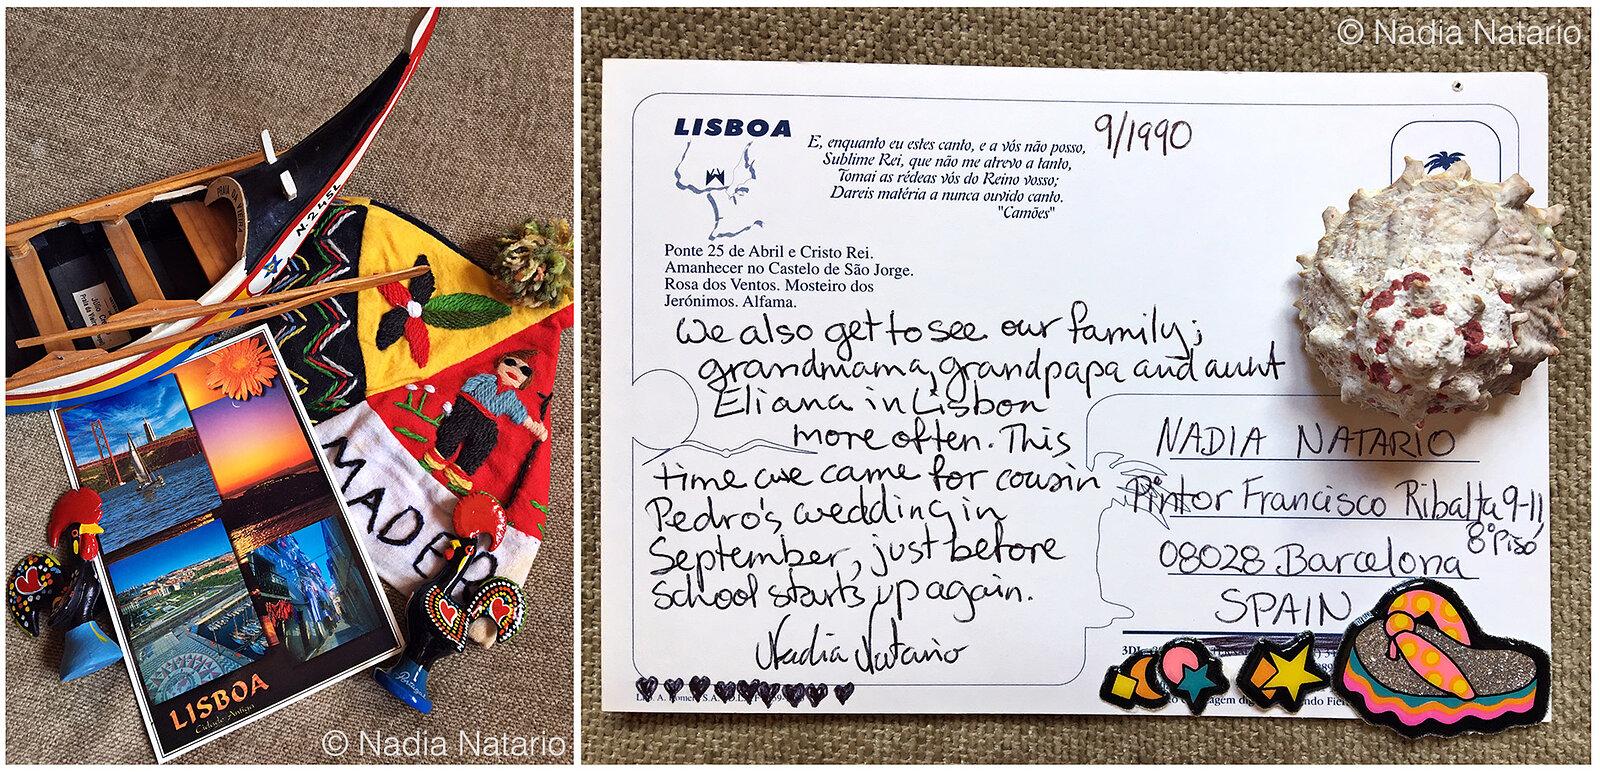 Postcards to Myself - Lisbon, Portugal, 1990